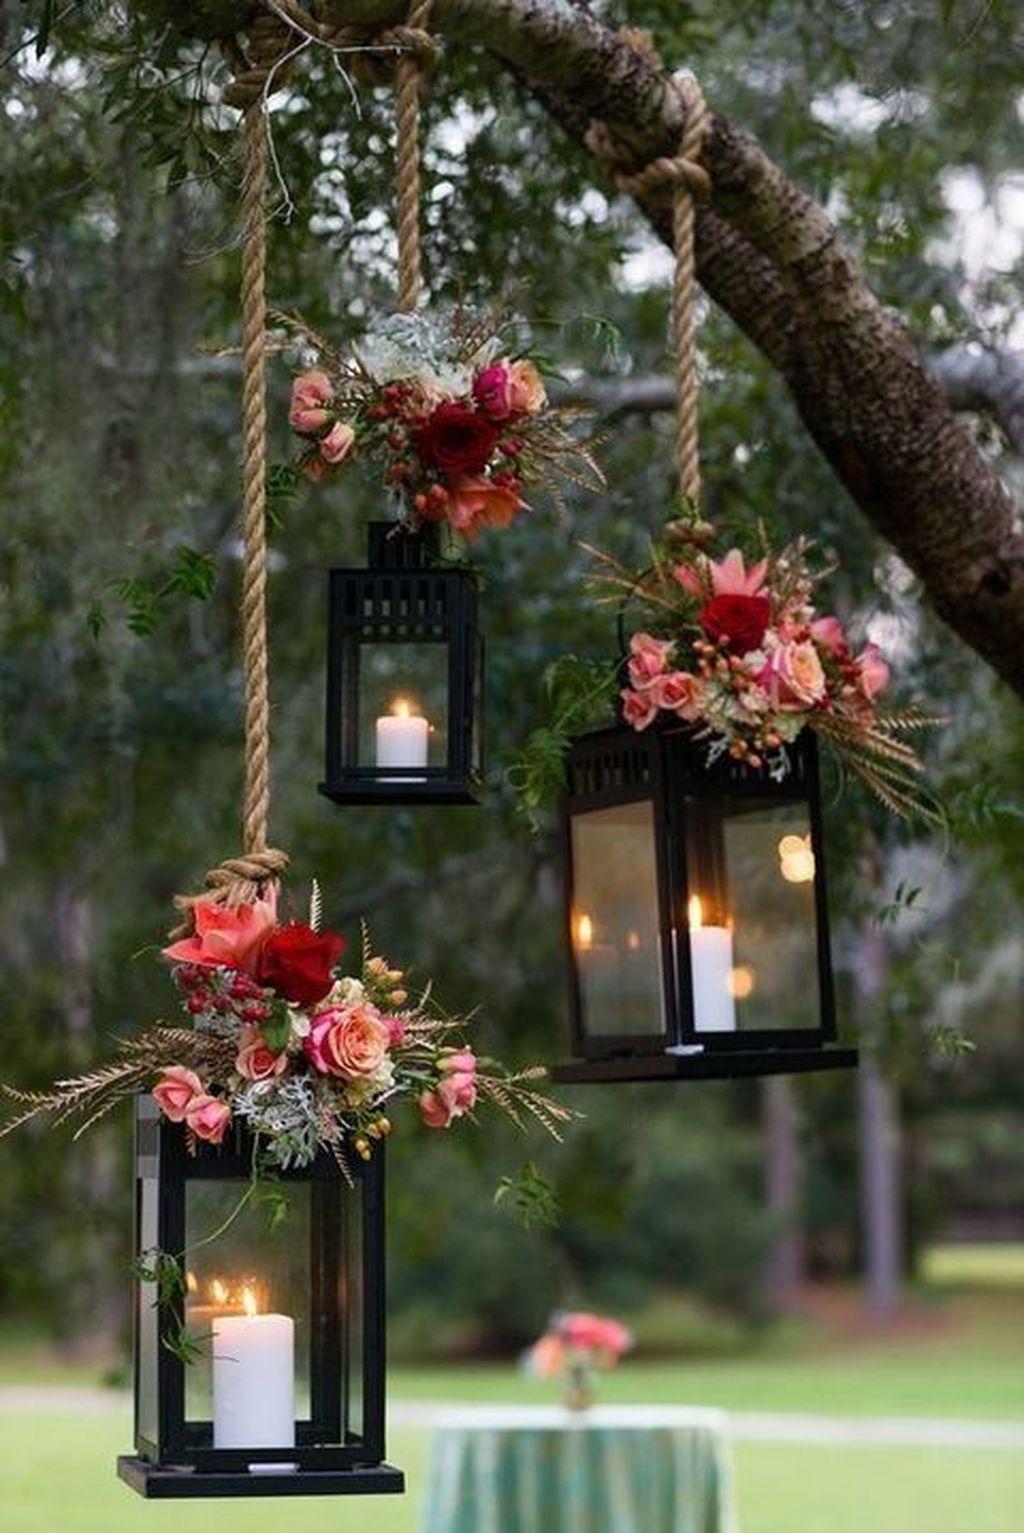 The Best Romantic Backyard Decorating Ideas 31